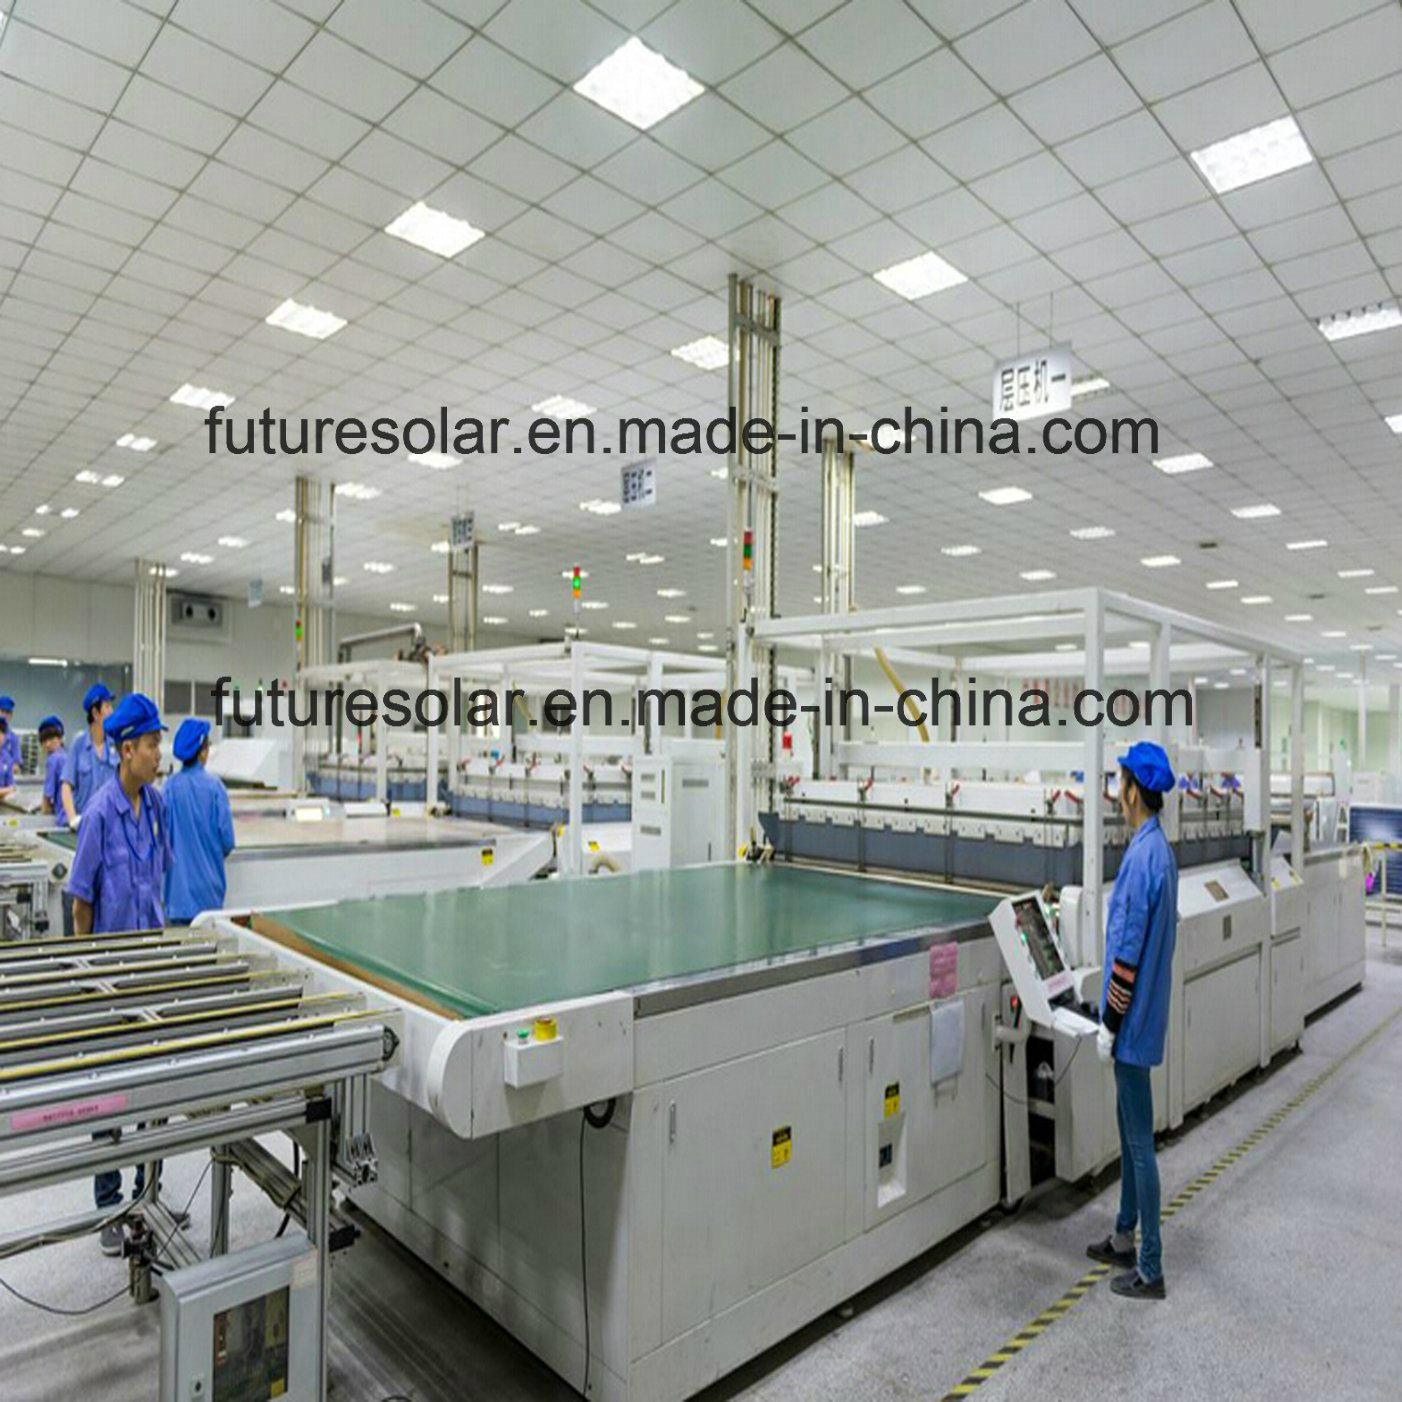 Futuresolar Great Quality 3kw on Grid Solar System with Warranty